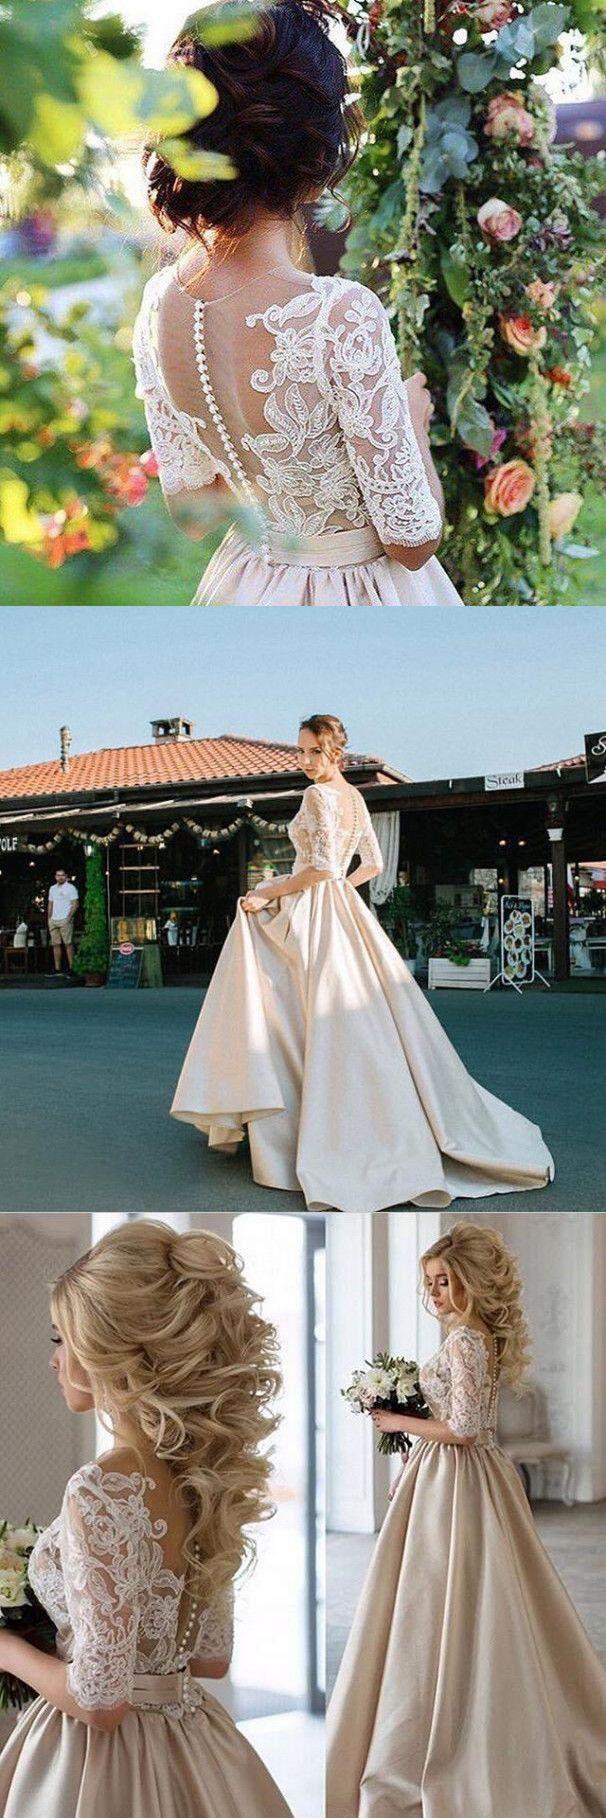 9dfce9eefc11 2017 half sleeves white lace wedding dress, modest wedding dress,2017 prom  dress, long prom dress, half sleeves prom dress, champagne prom dress with  white ...